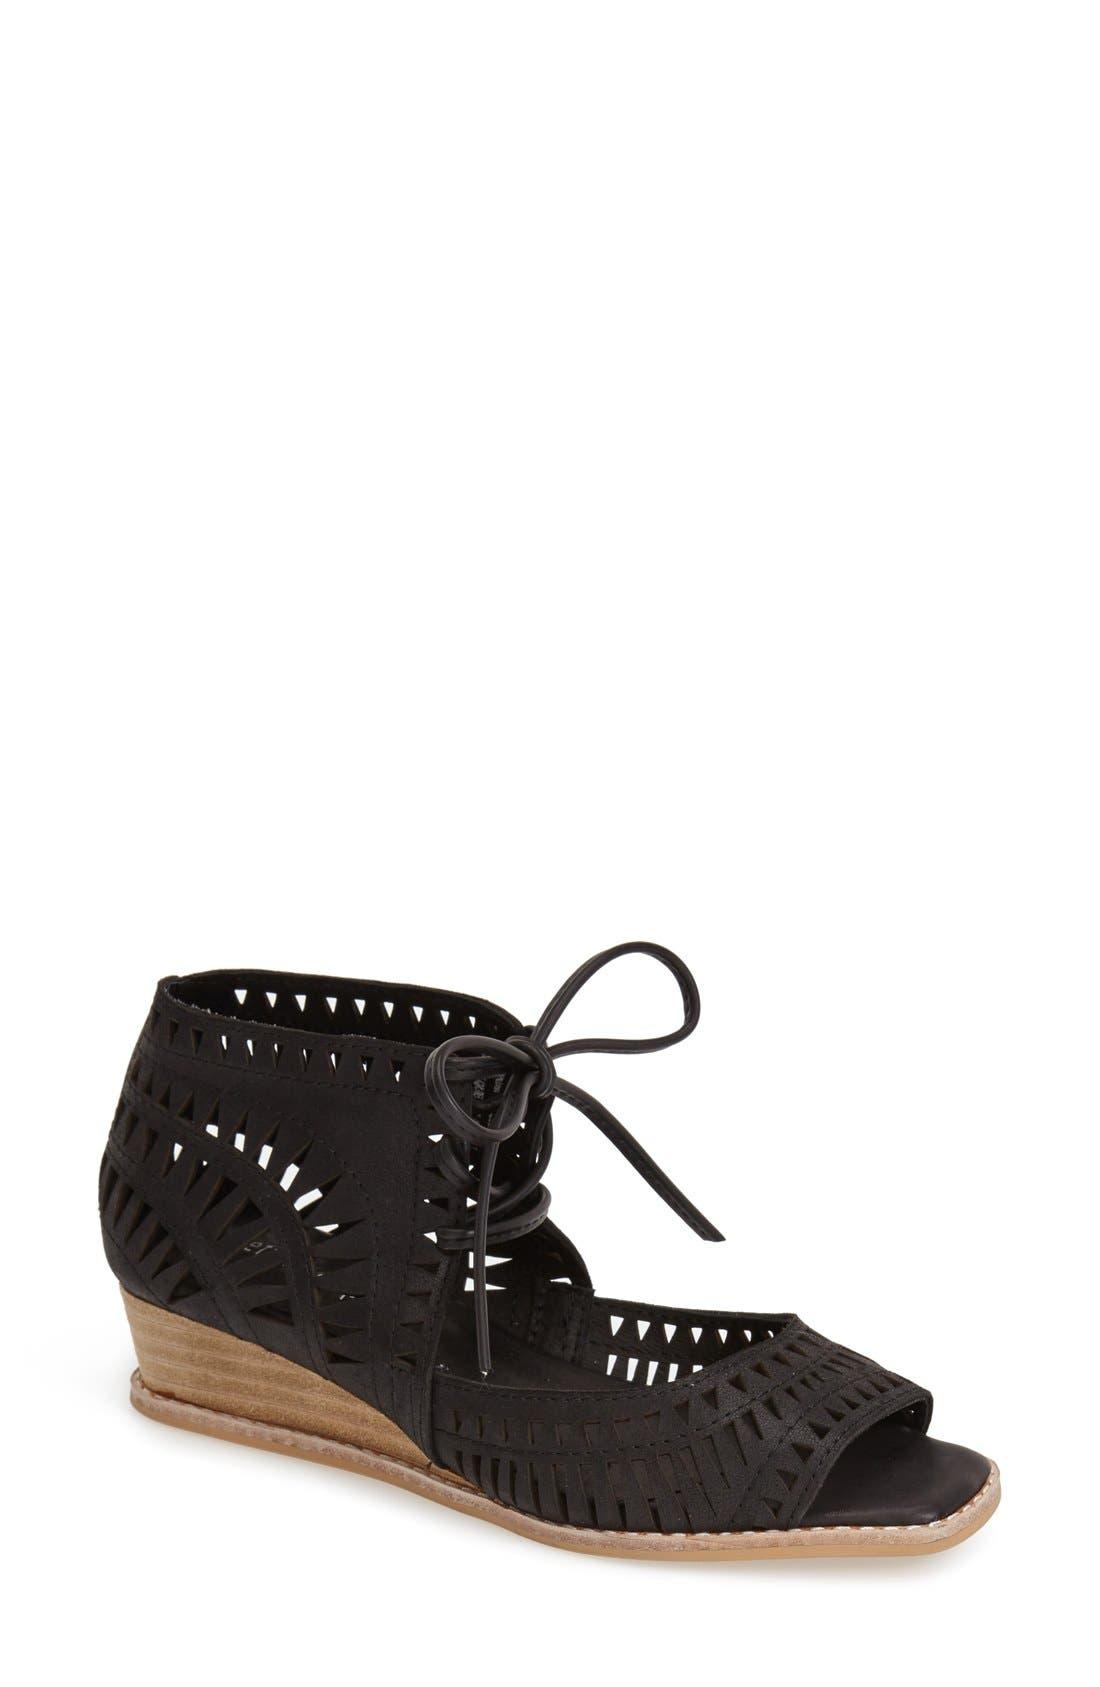 'Rodillo' Wedge Sandal, Main, color, BLACK LEATHER